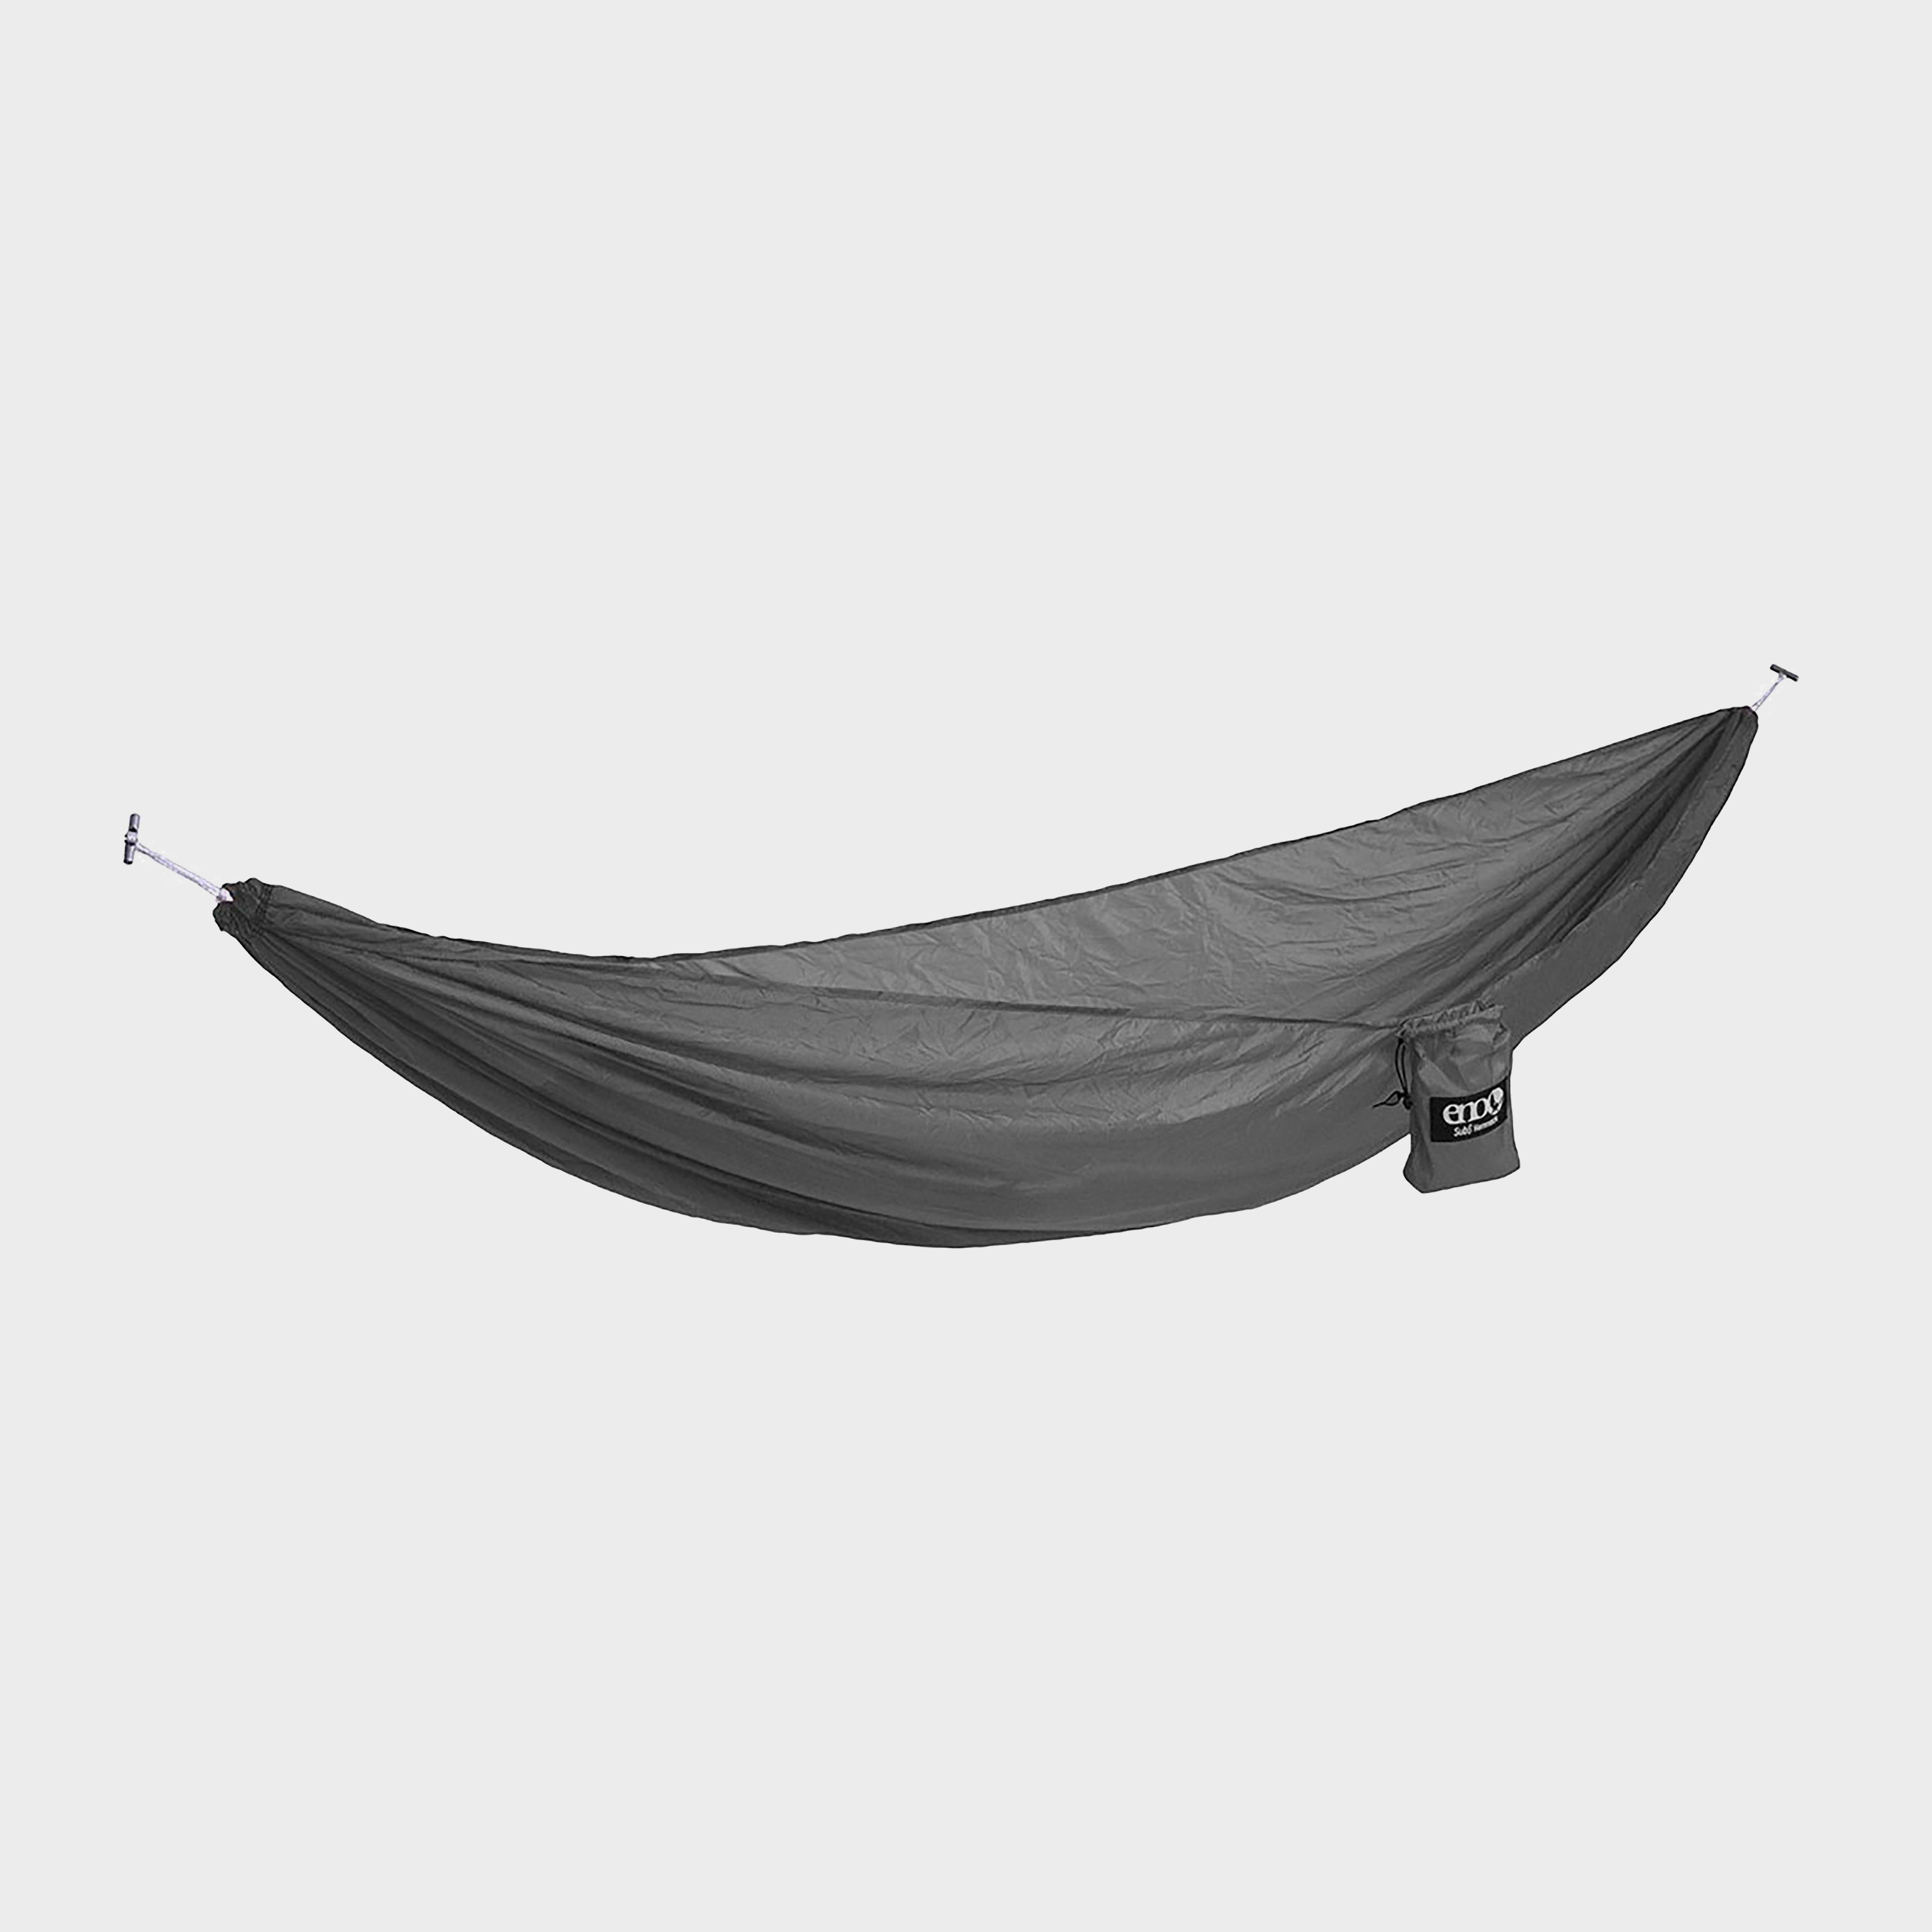 Eno Sub6 Ultralight Hammock - Grey/Hammock, Grey